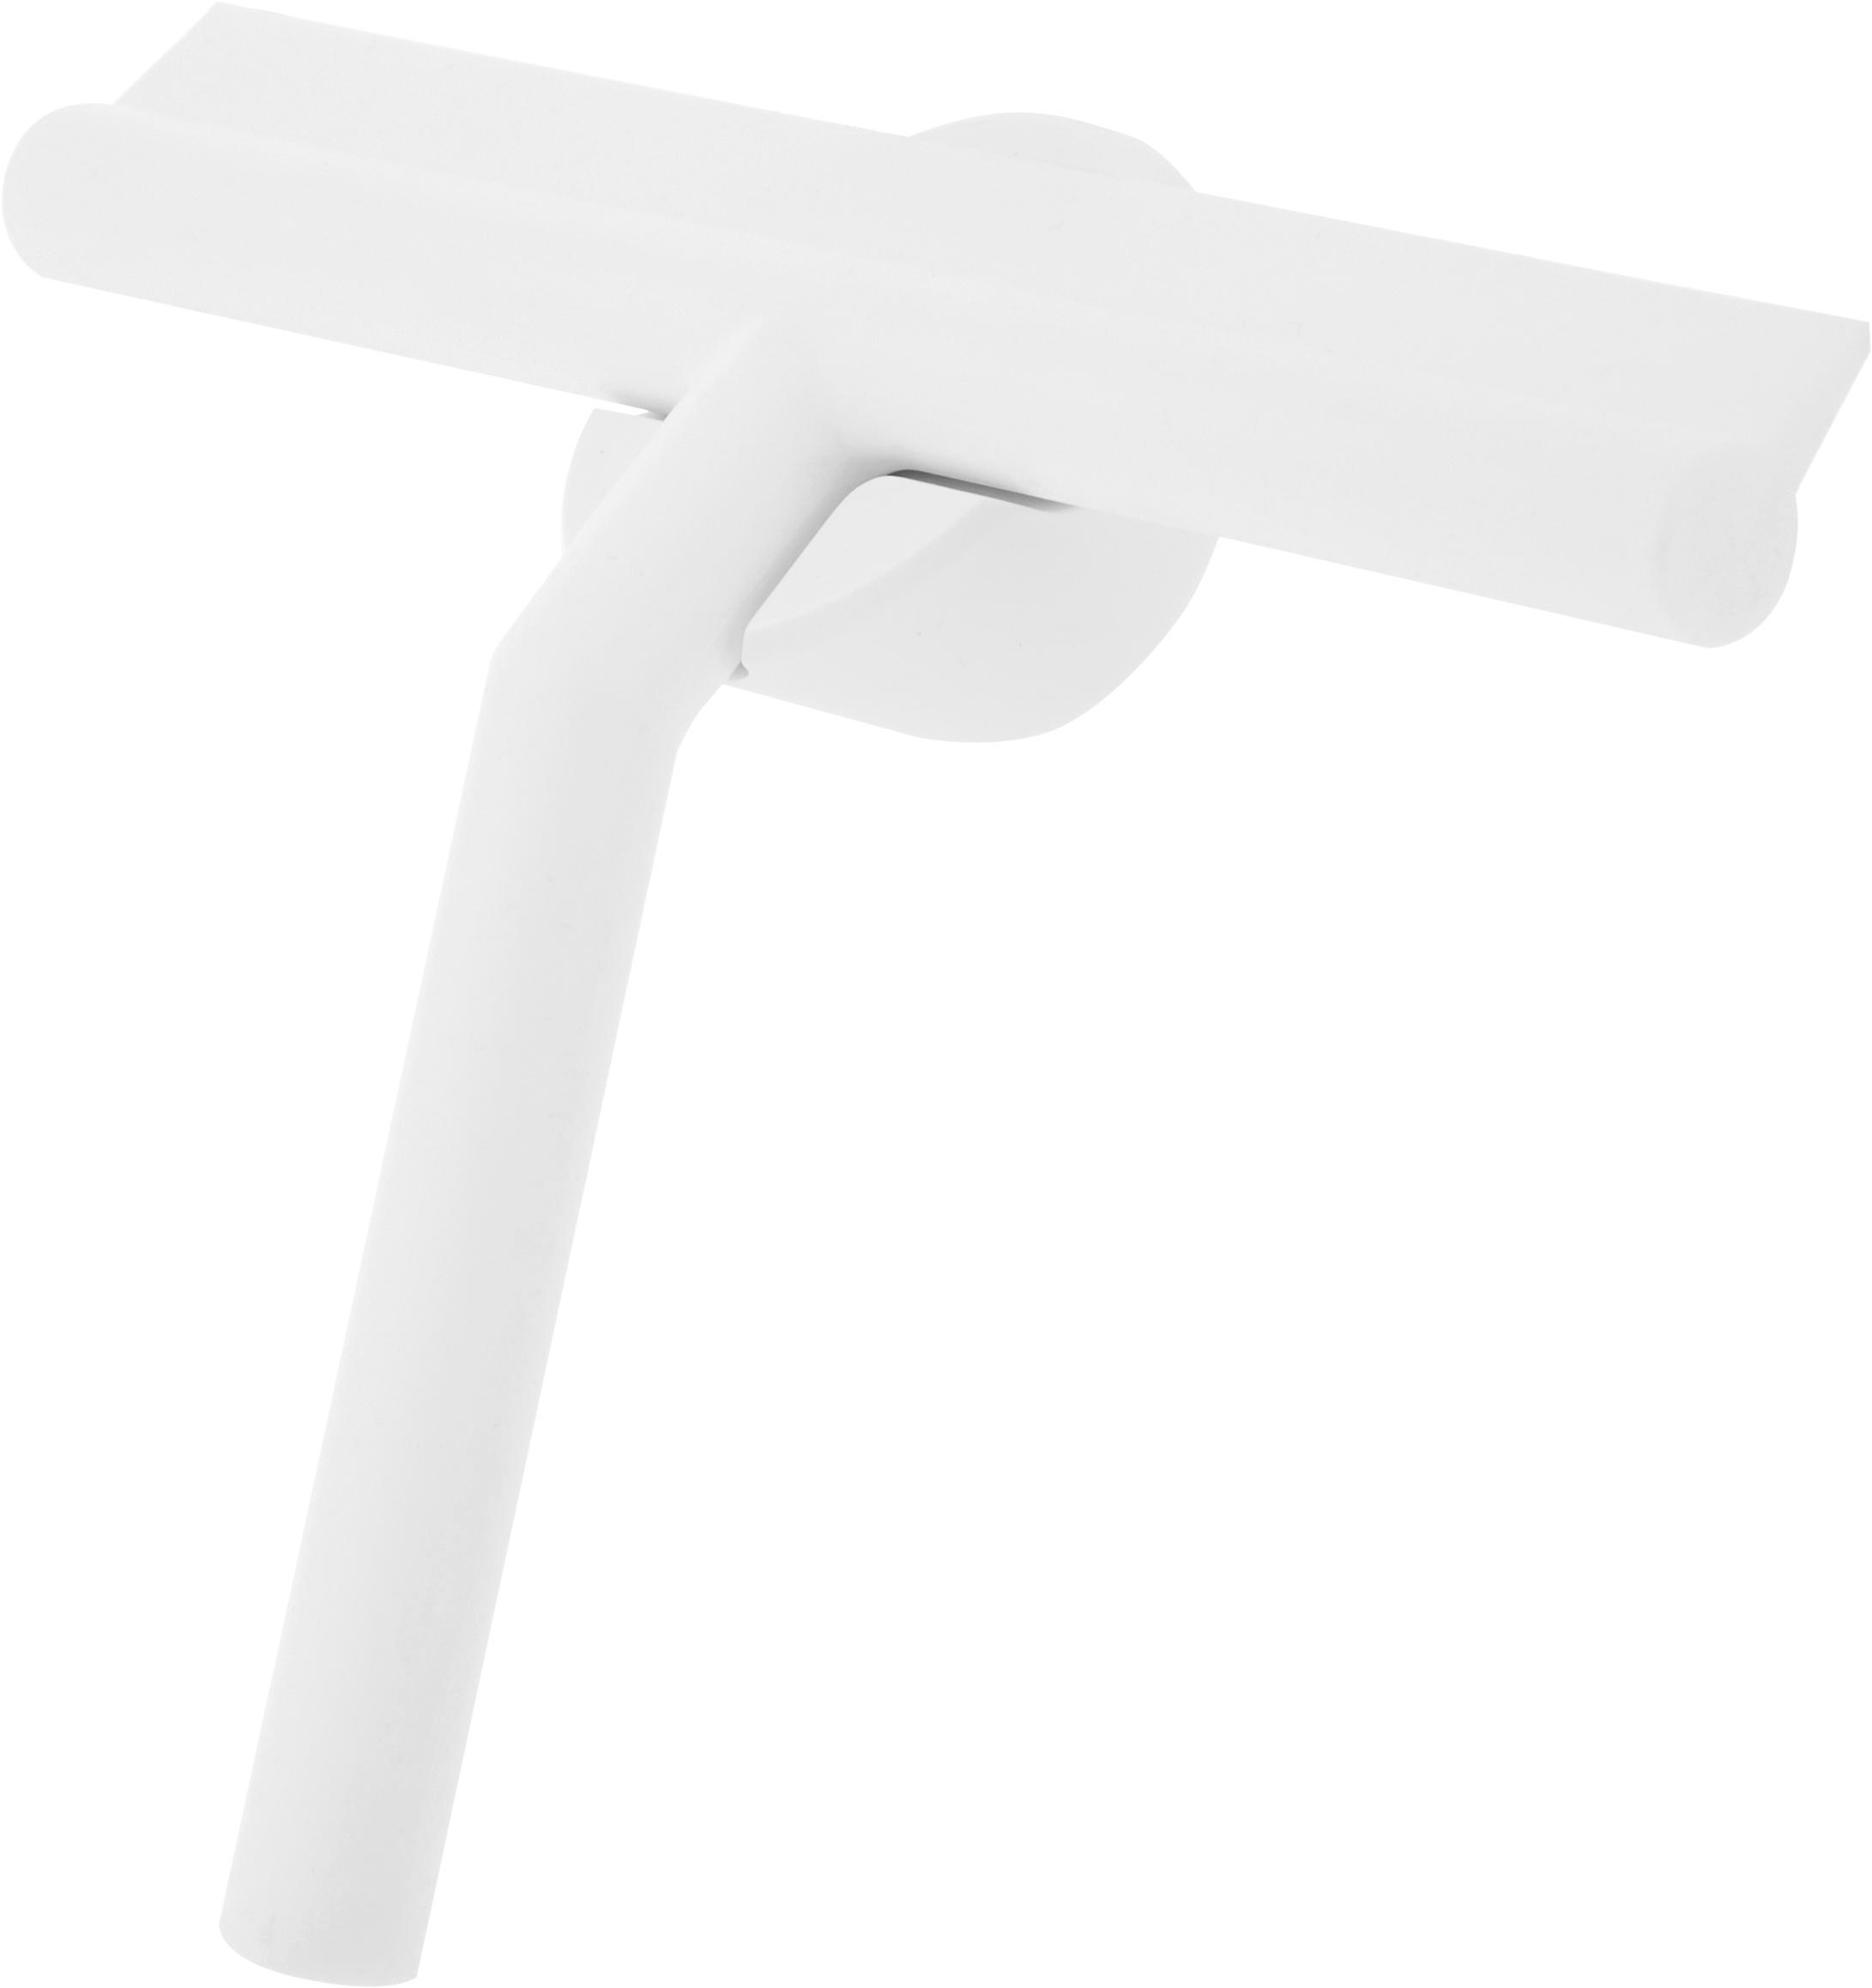 Limpiacristales Nova, Blanco, An 21 x Al 5 cm